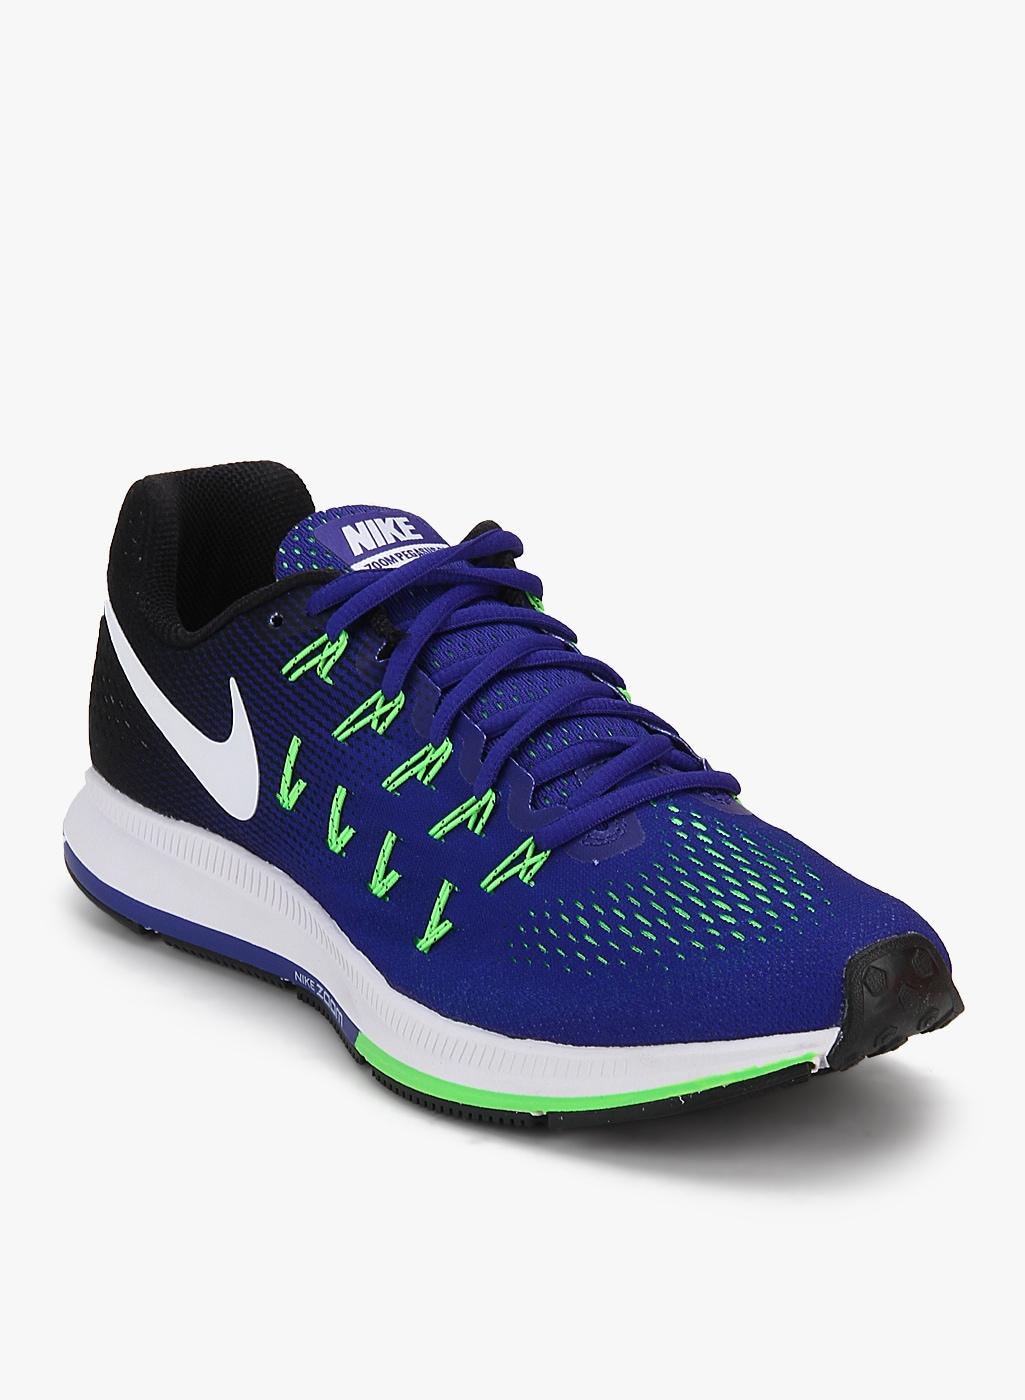 Nike Air Zoom Pegasus 33 Black Running Shoes